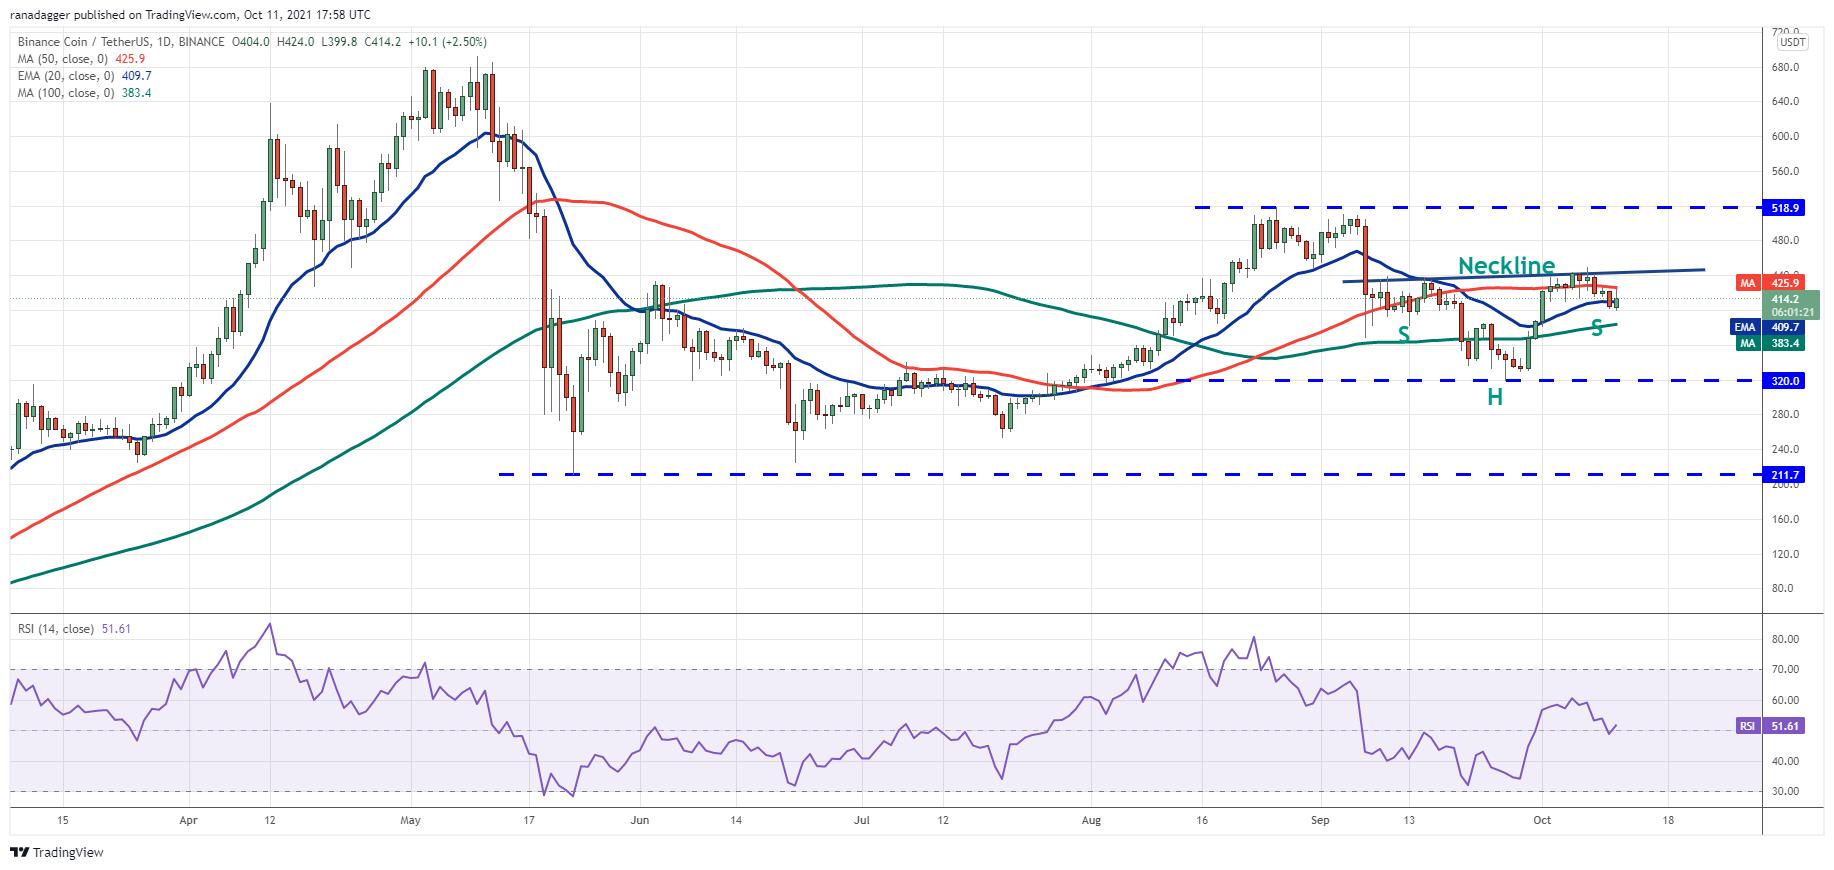 Price analysis 10/11: BTC, ETH, BNB, ADA, XRP, SOL, DOGE, DOT, LUNA, UNI4